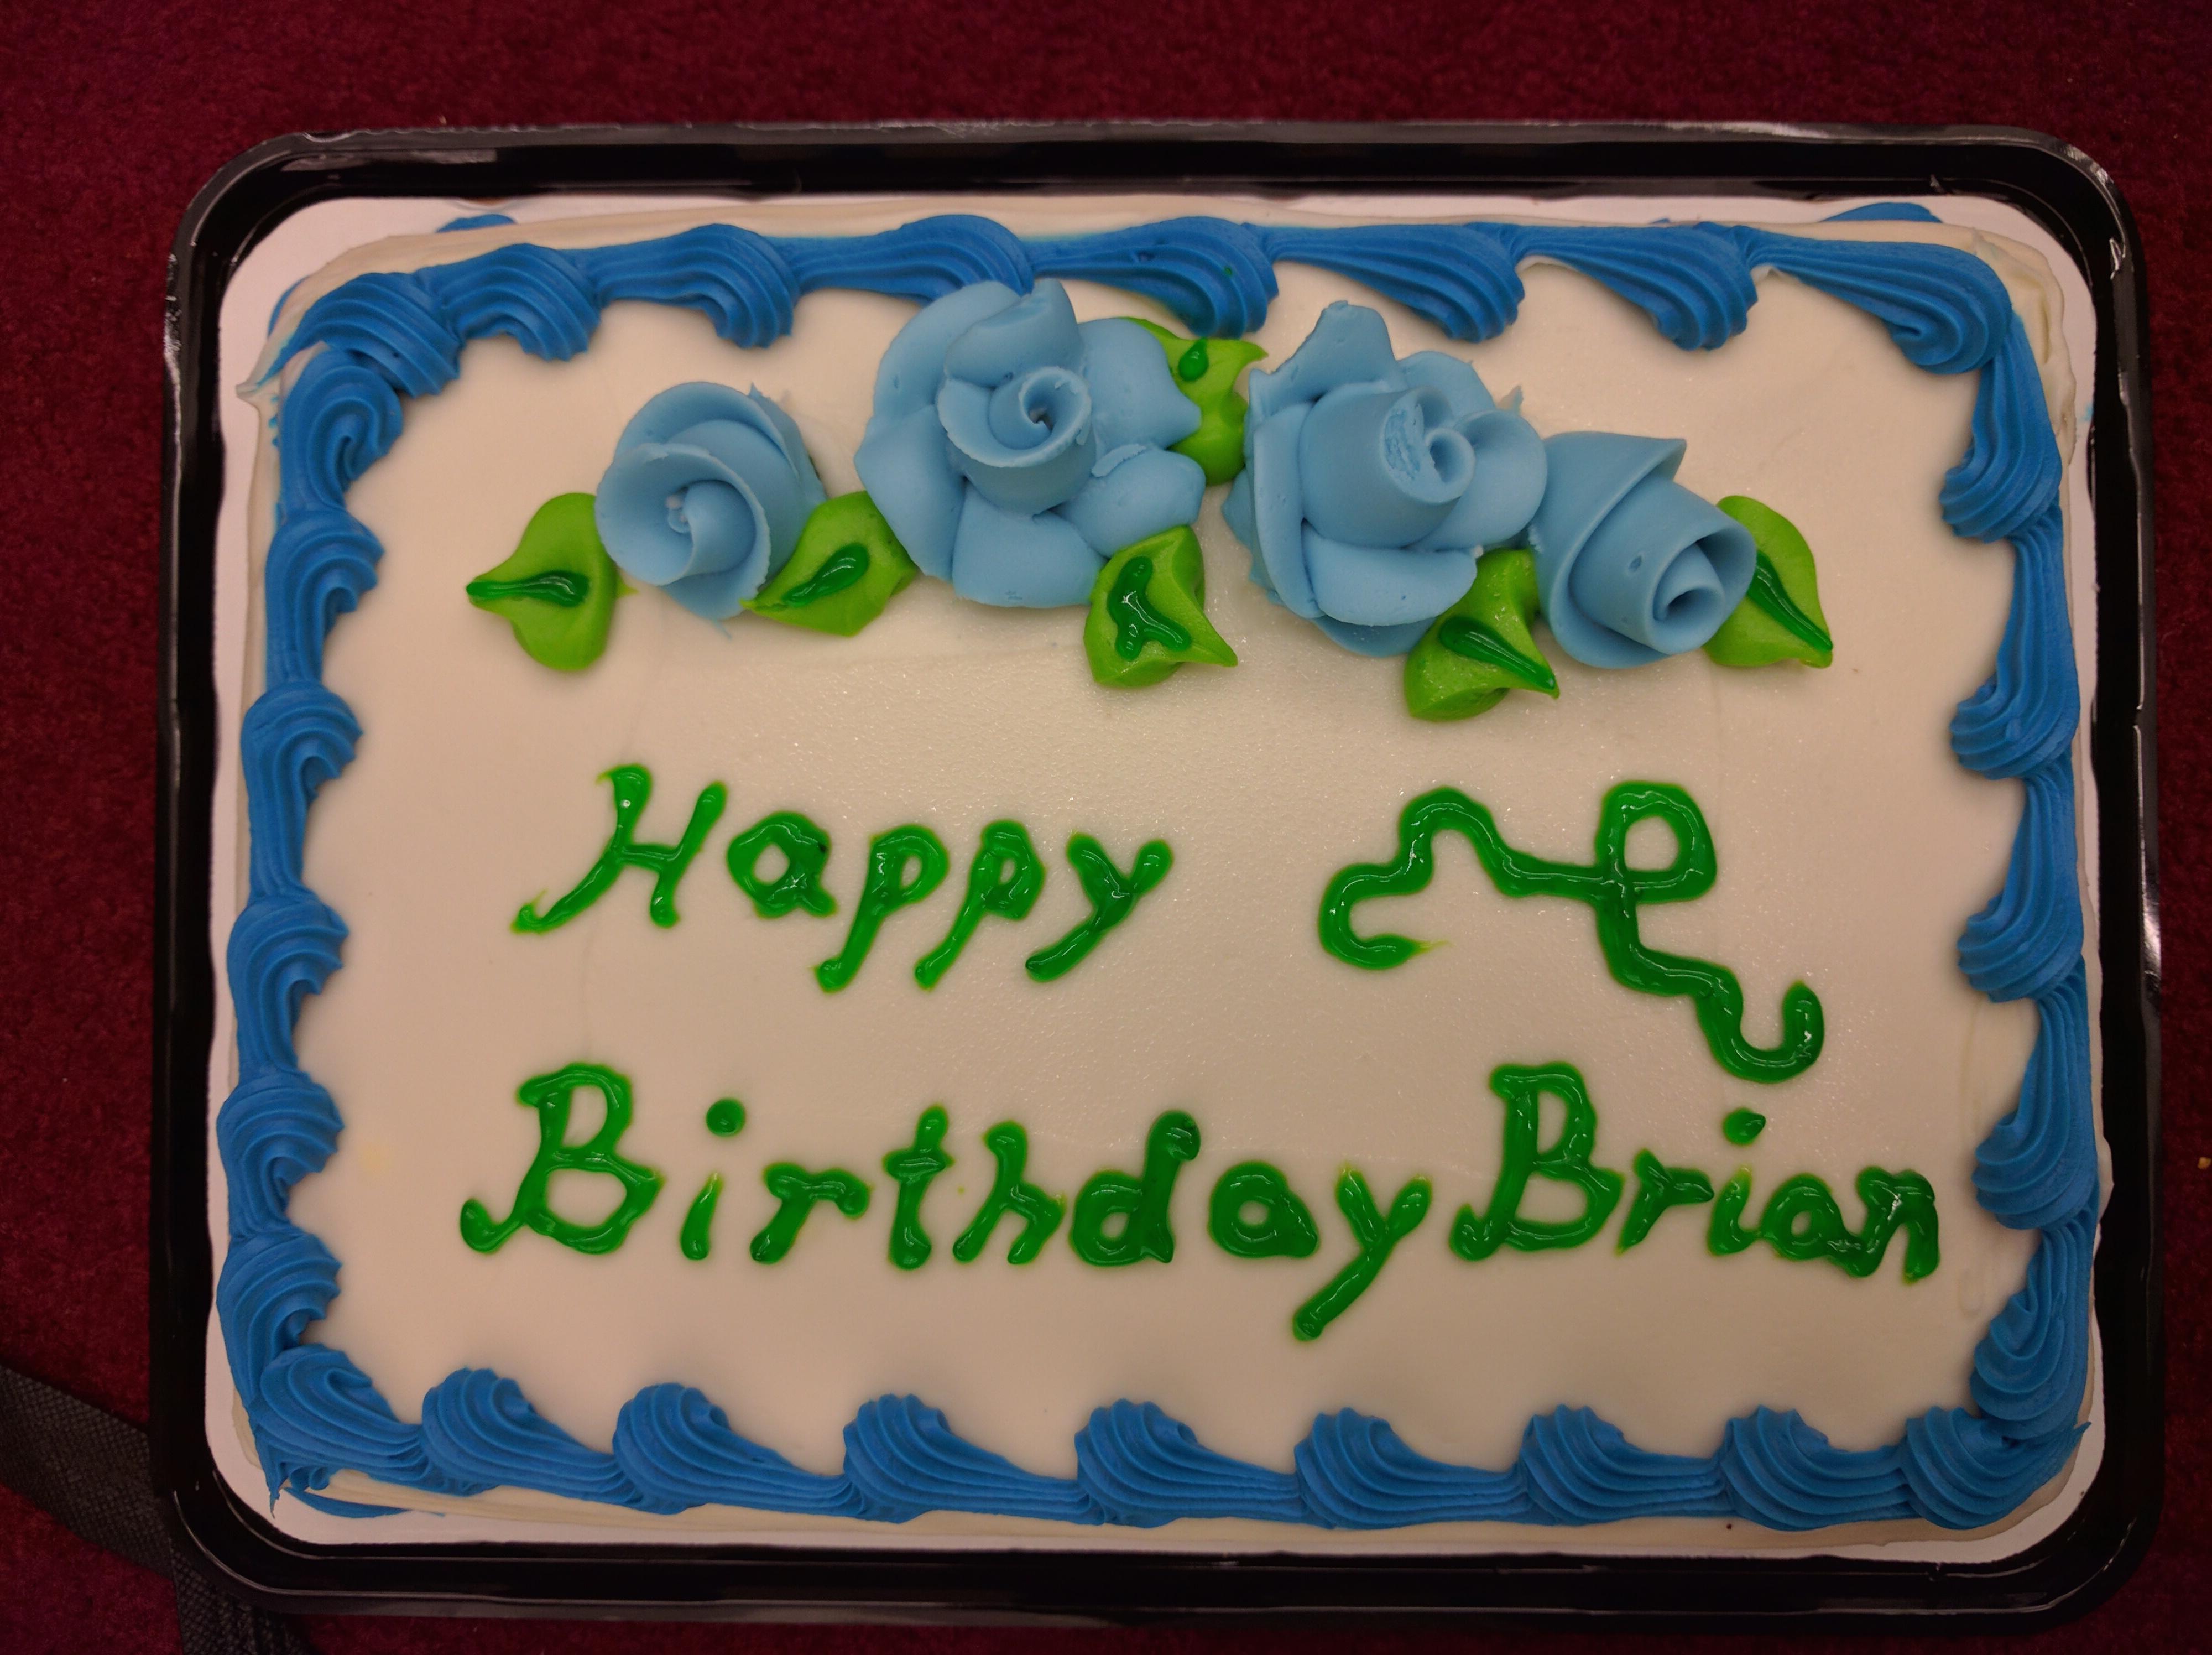 Funny Cake Decorating Mistakes Instadecorus